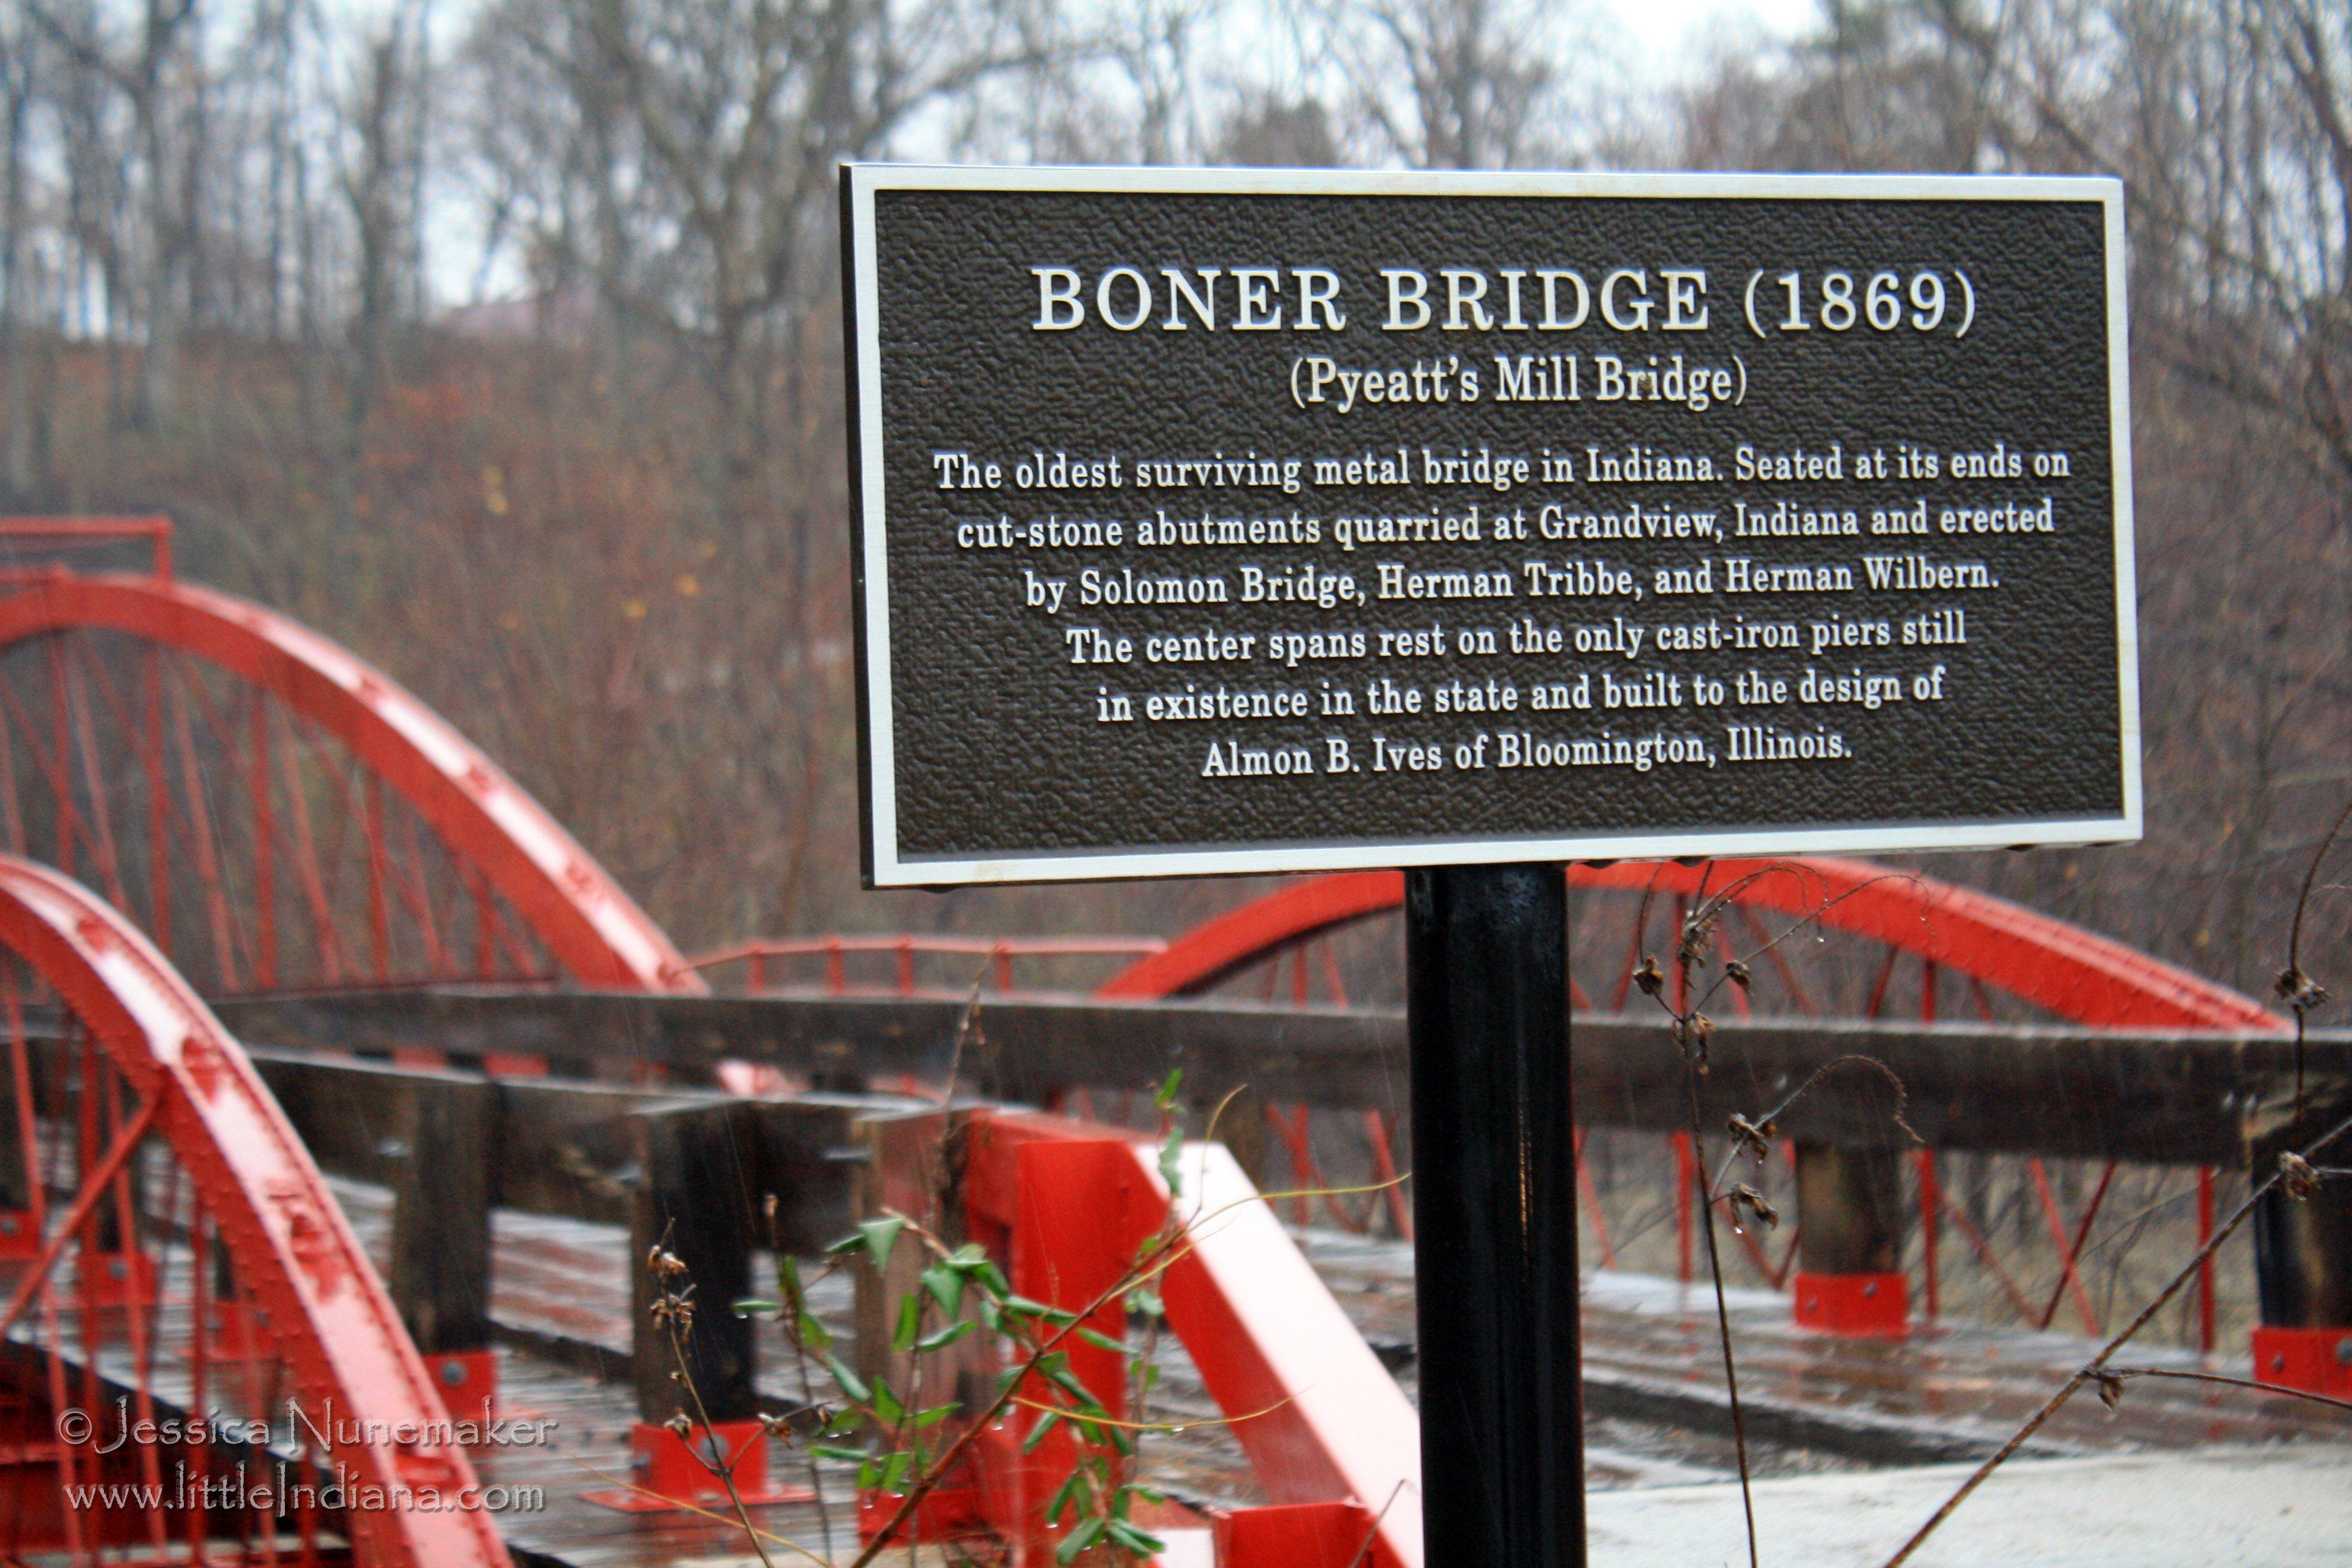 Indiana spencer county rockport - Boner Bridge Or Pyeatt S Mill Bridge In Spencer County